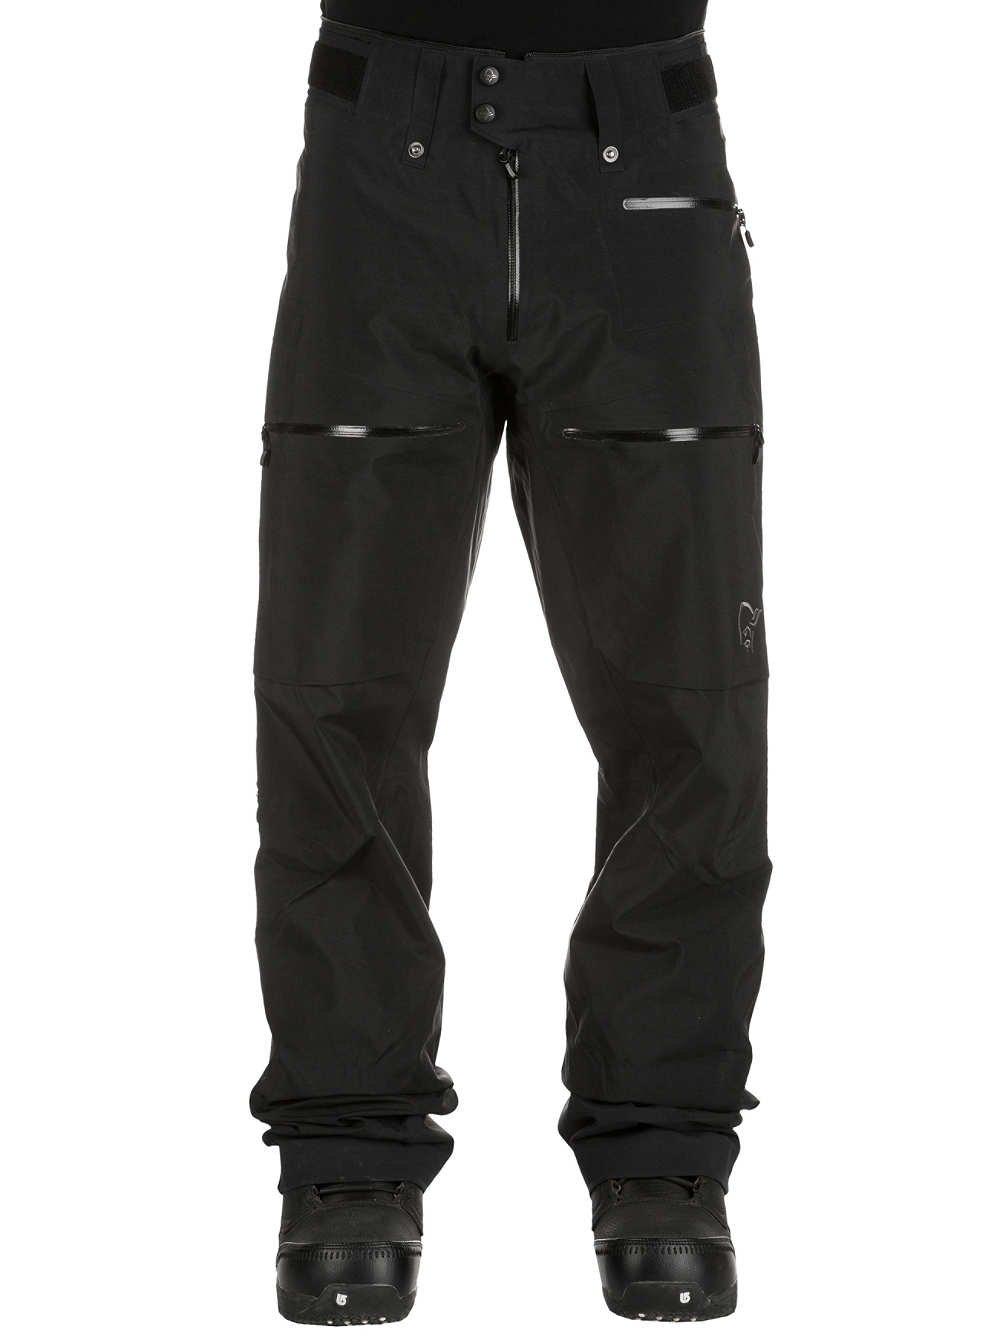 2f1f6716 Snowwear Pant Men Norrona Lofoten Gore-Tex Pro Light Pants: Amazon.co.uk:  Sports & Outdoors